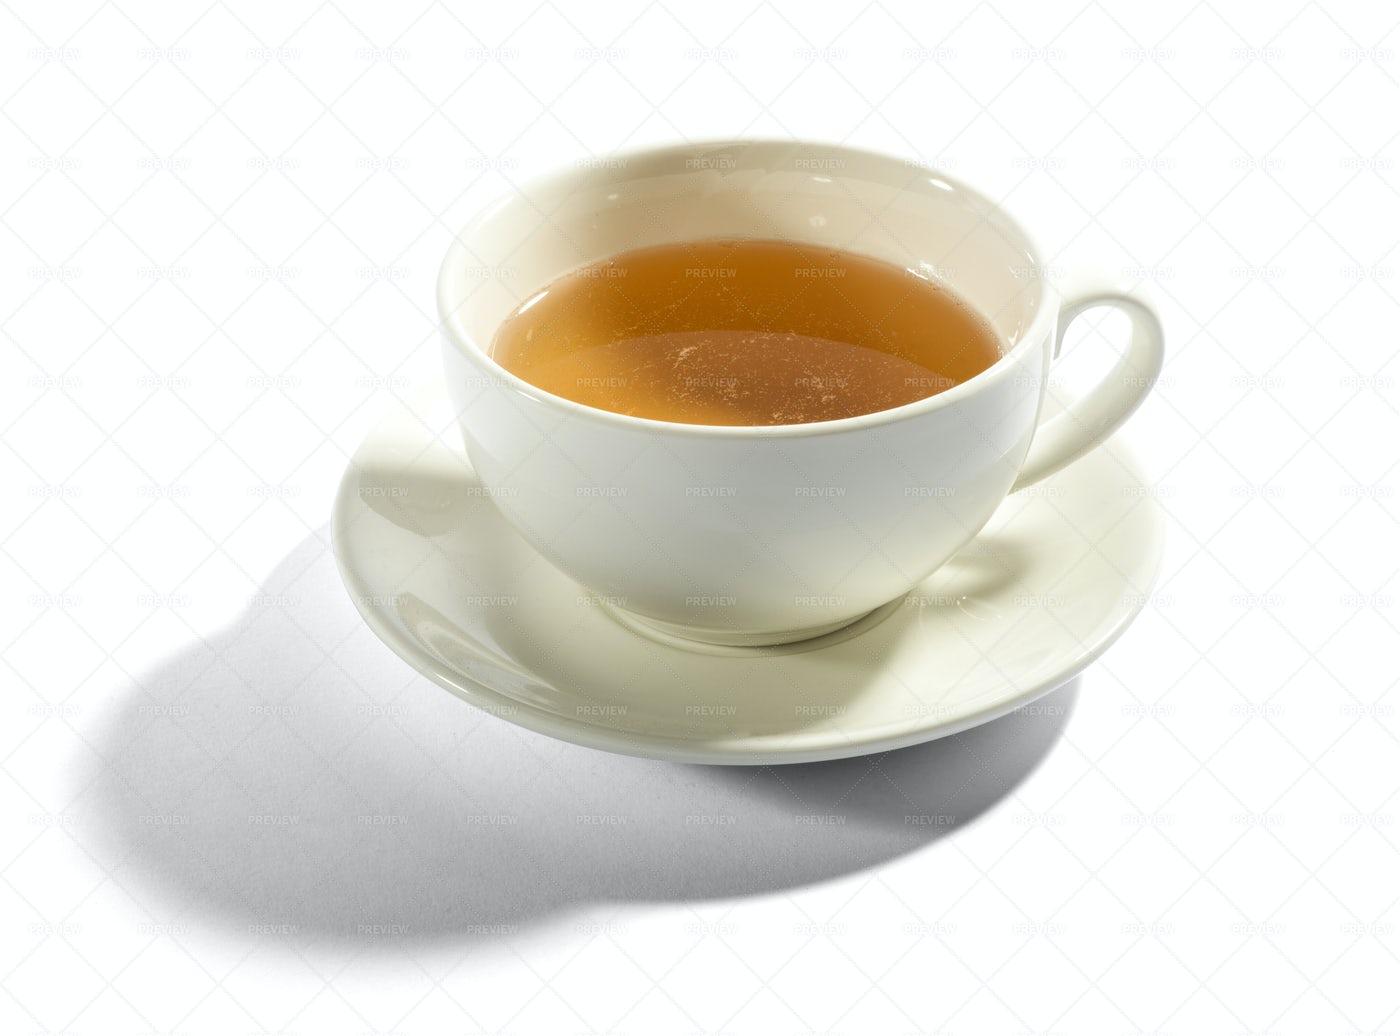 Milky Cup Of Tea: Stock Photos